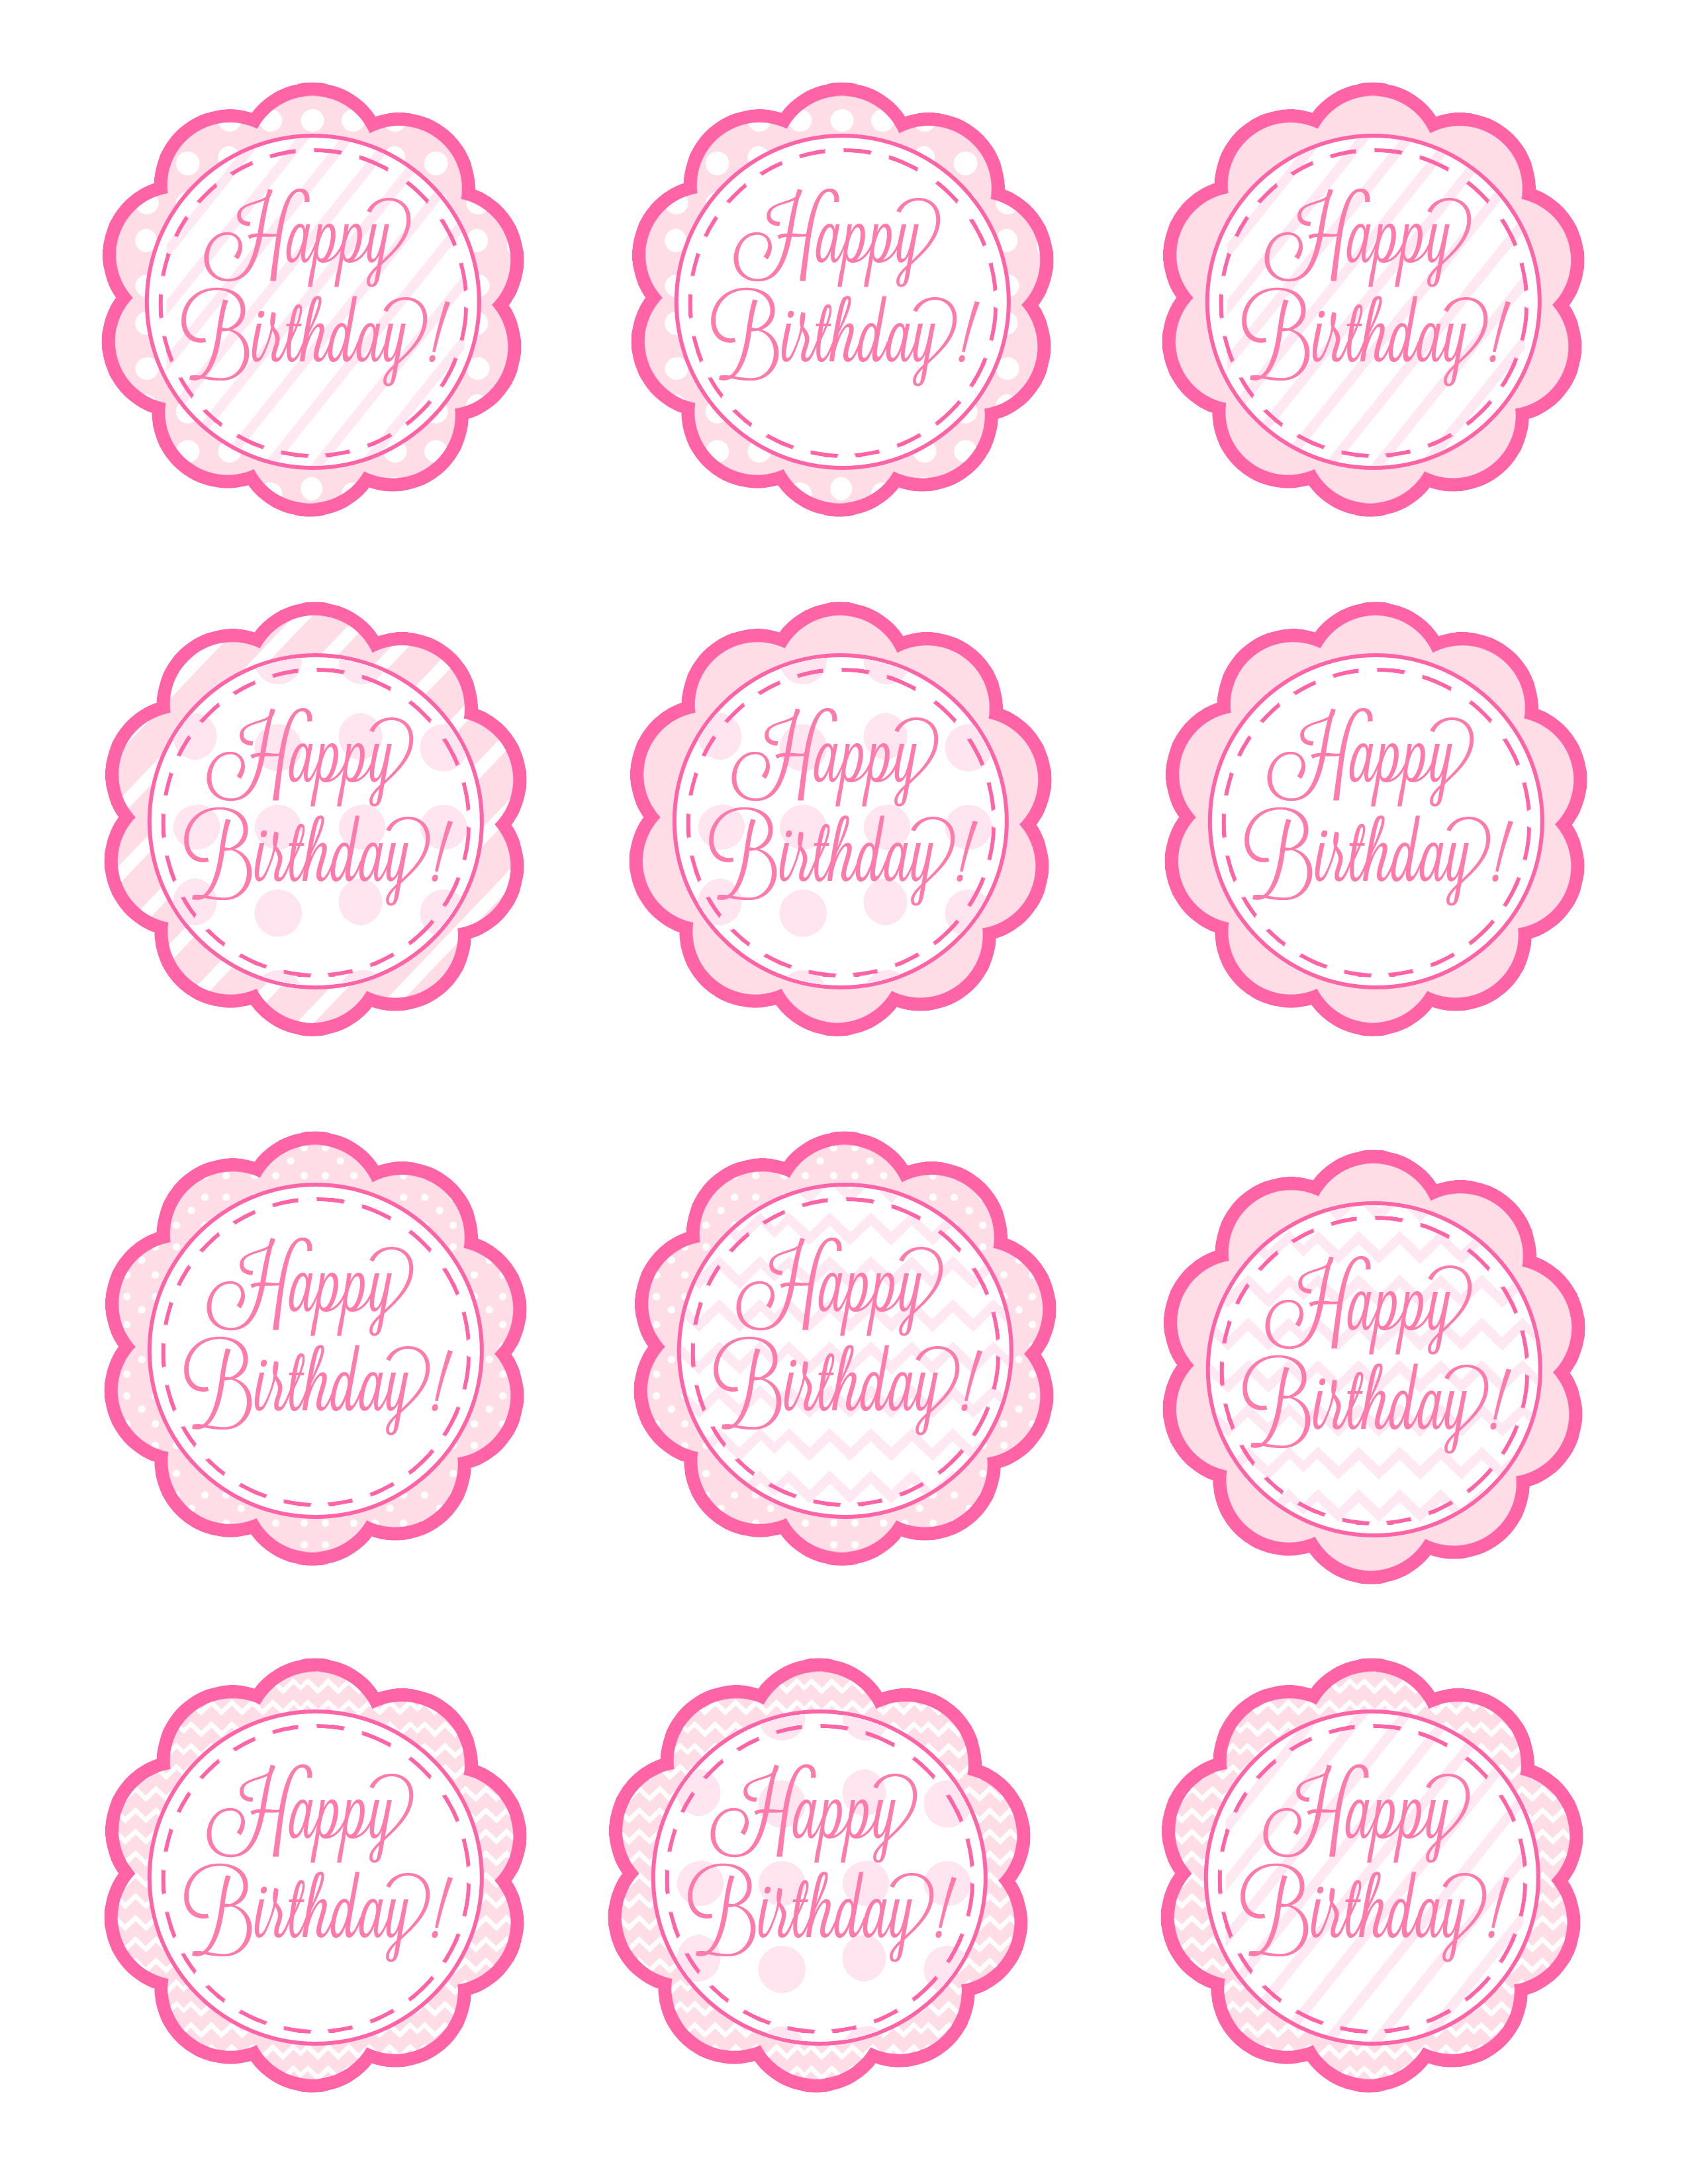 6 Images of Birthday Cupcake Printable Tags